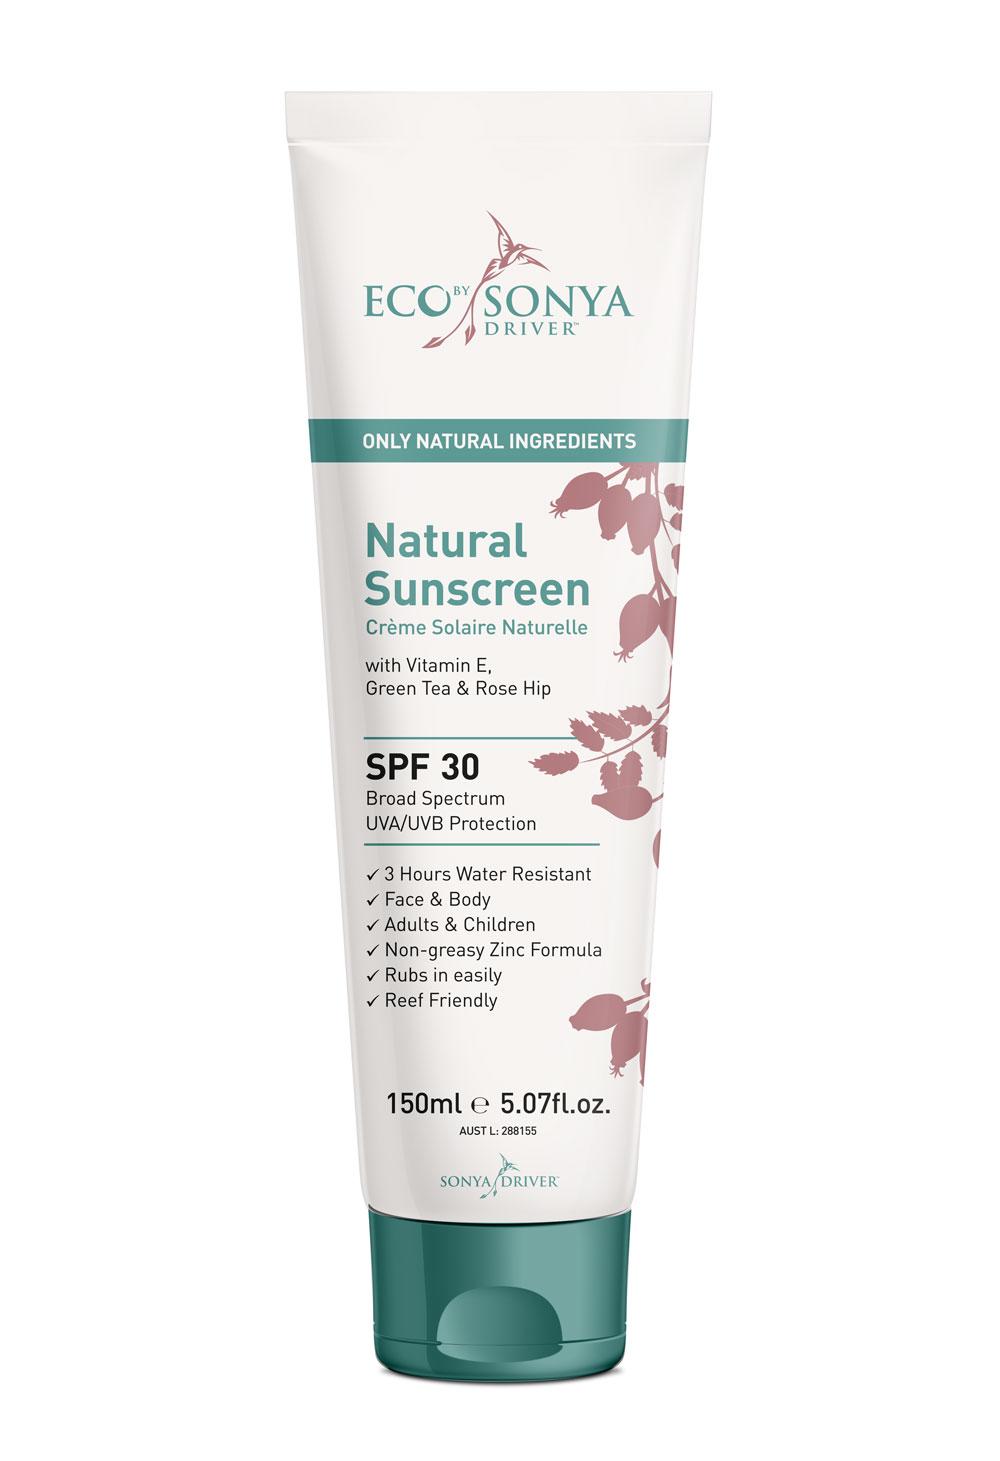 Eco Tan Eco by Sonya Driver Natural Rose Hip Sunscreen